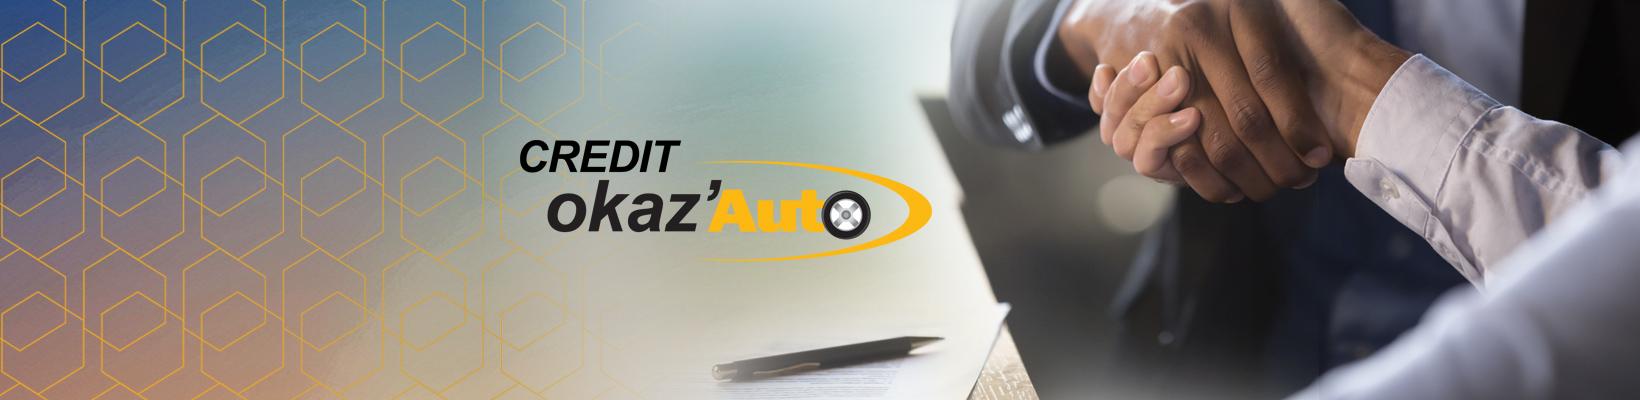 1640x400-credit-okaz'Auto